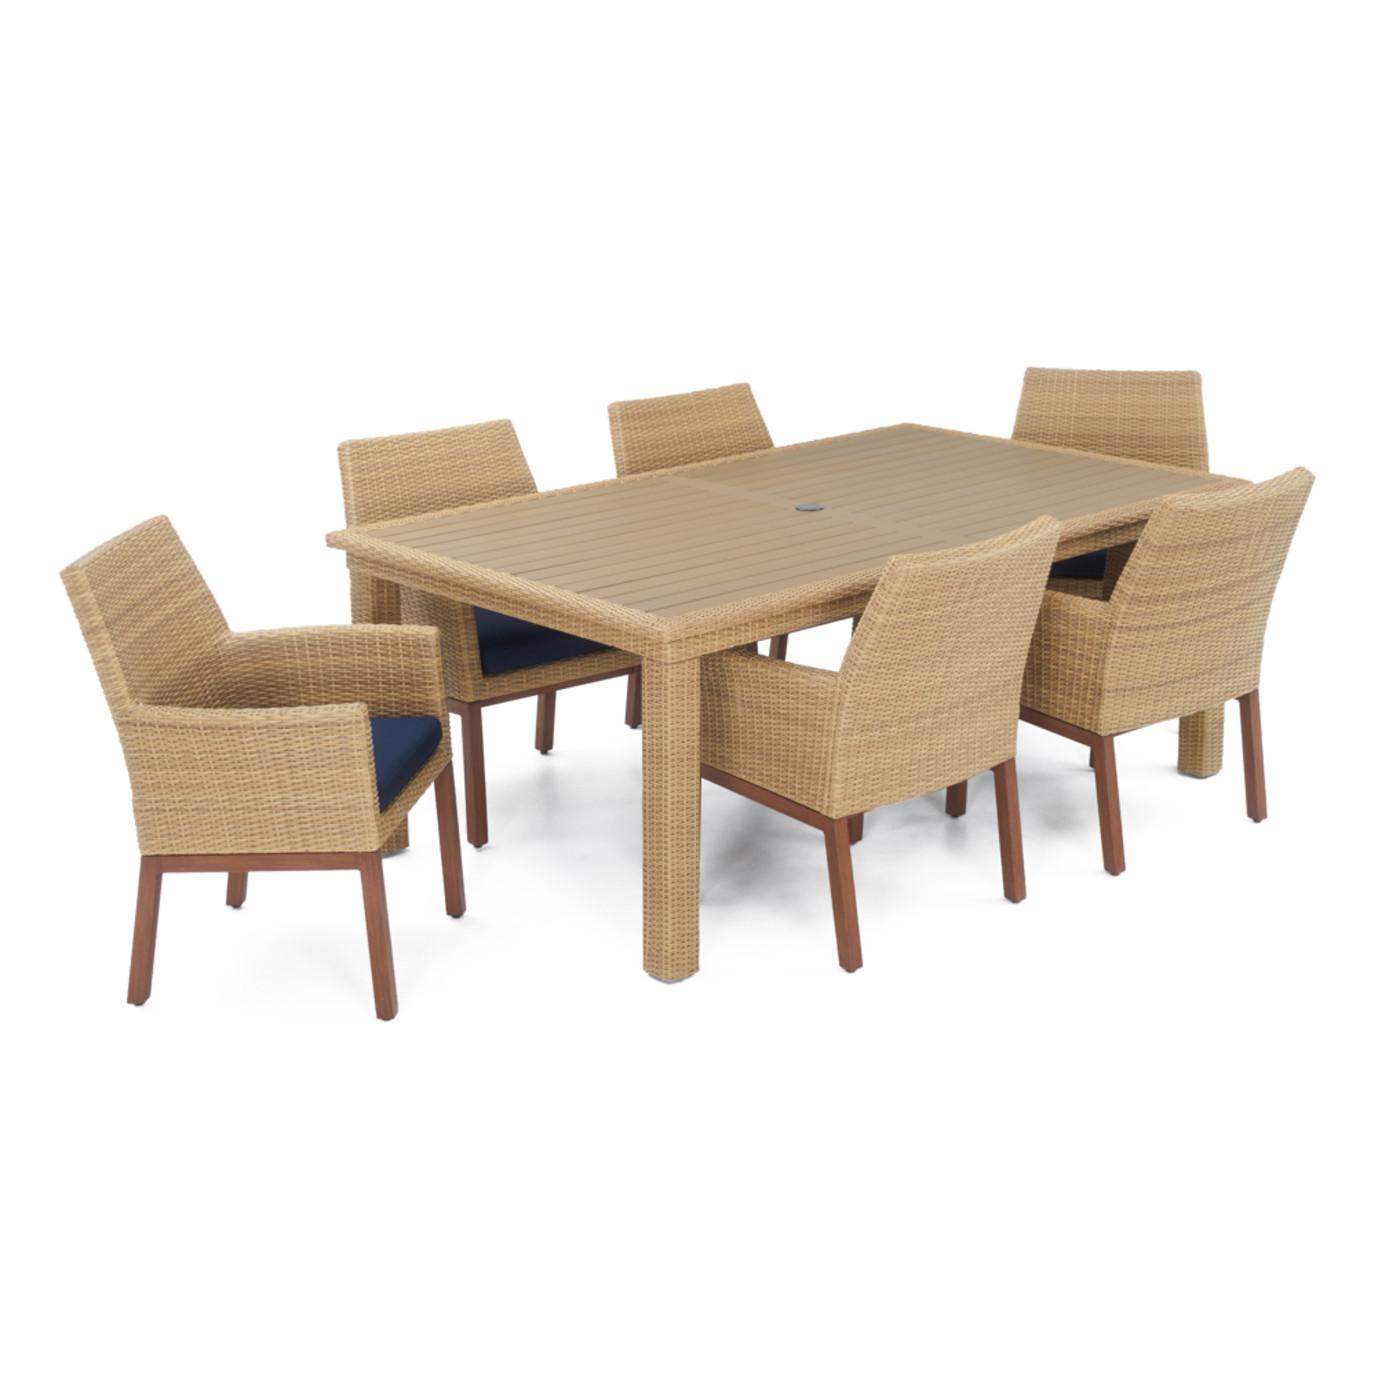 Mili™ 7pc Dining Set - Navy Blue